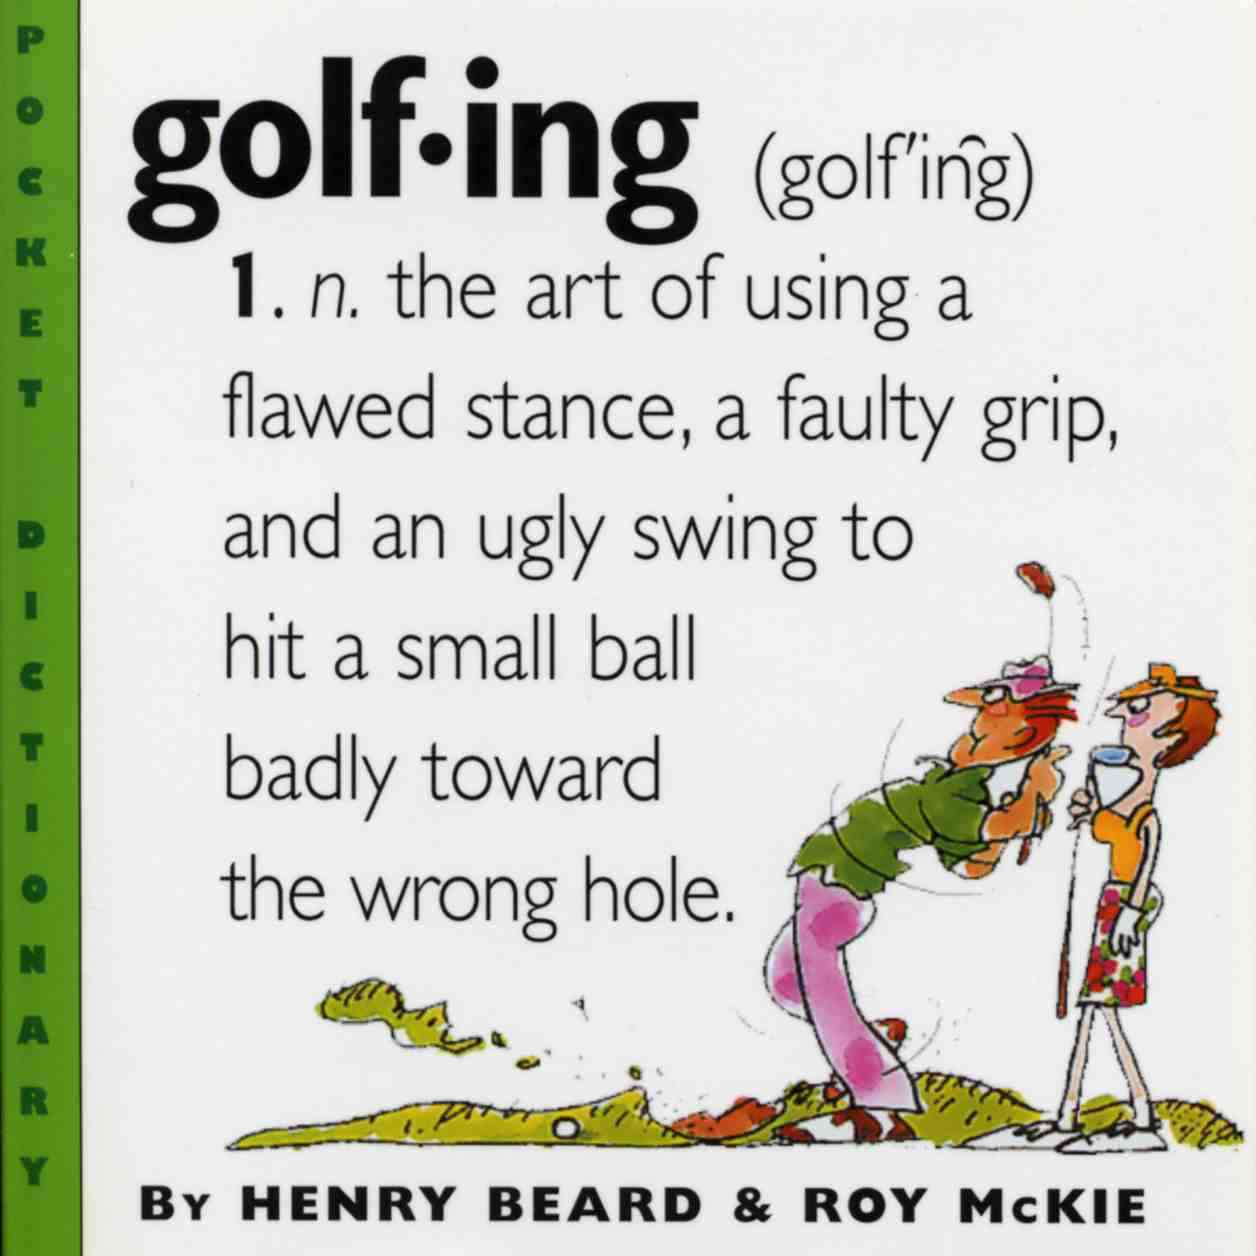 Golfing: A Duffer's Dictionary (Paperback)